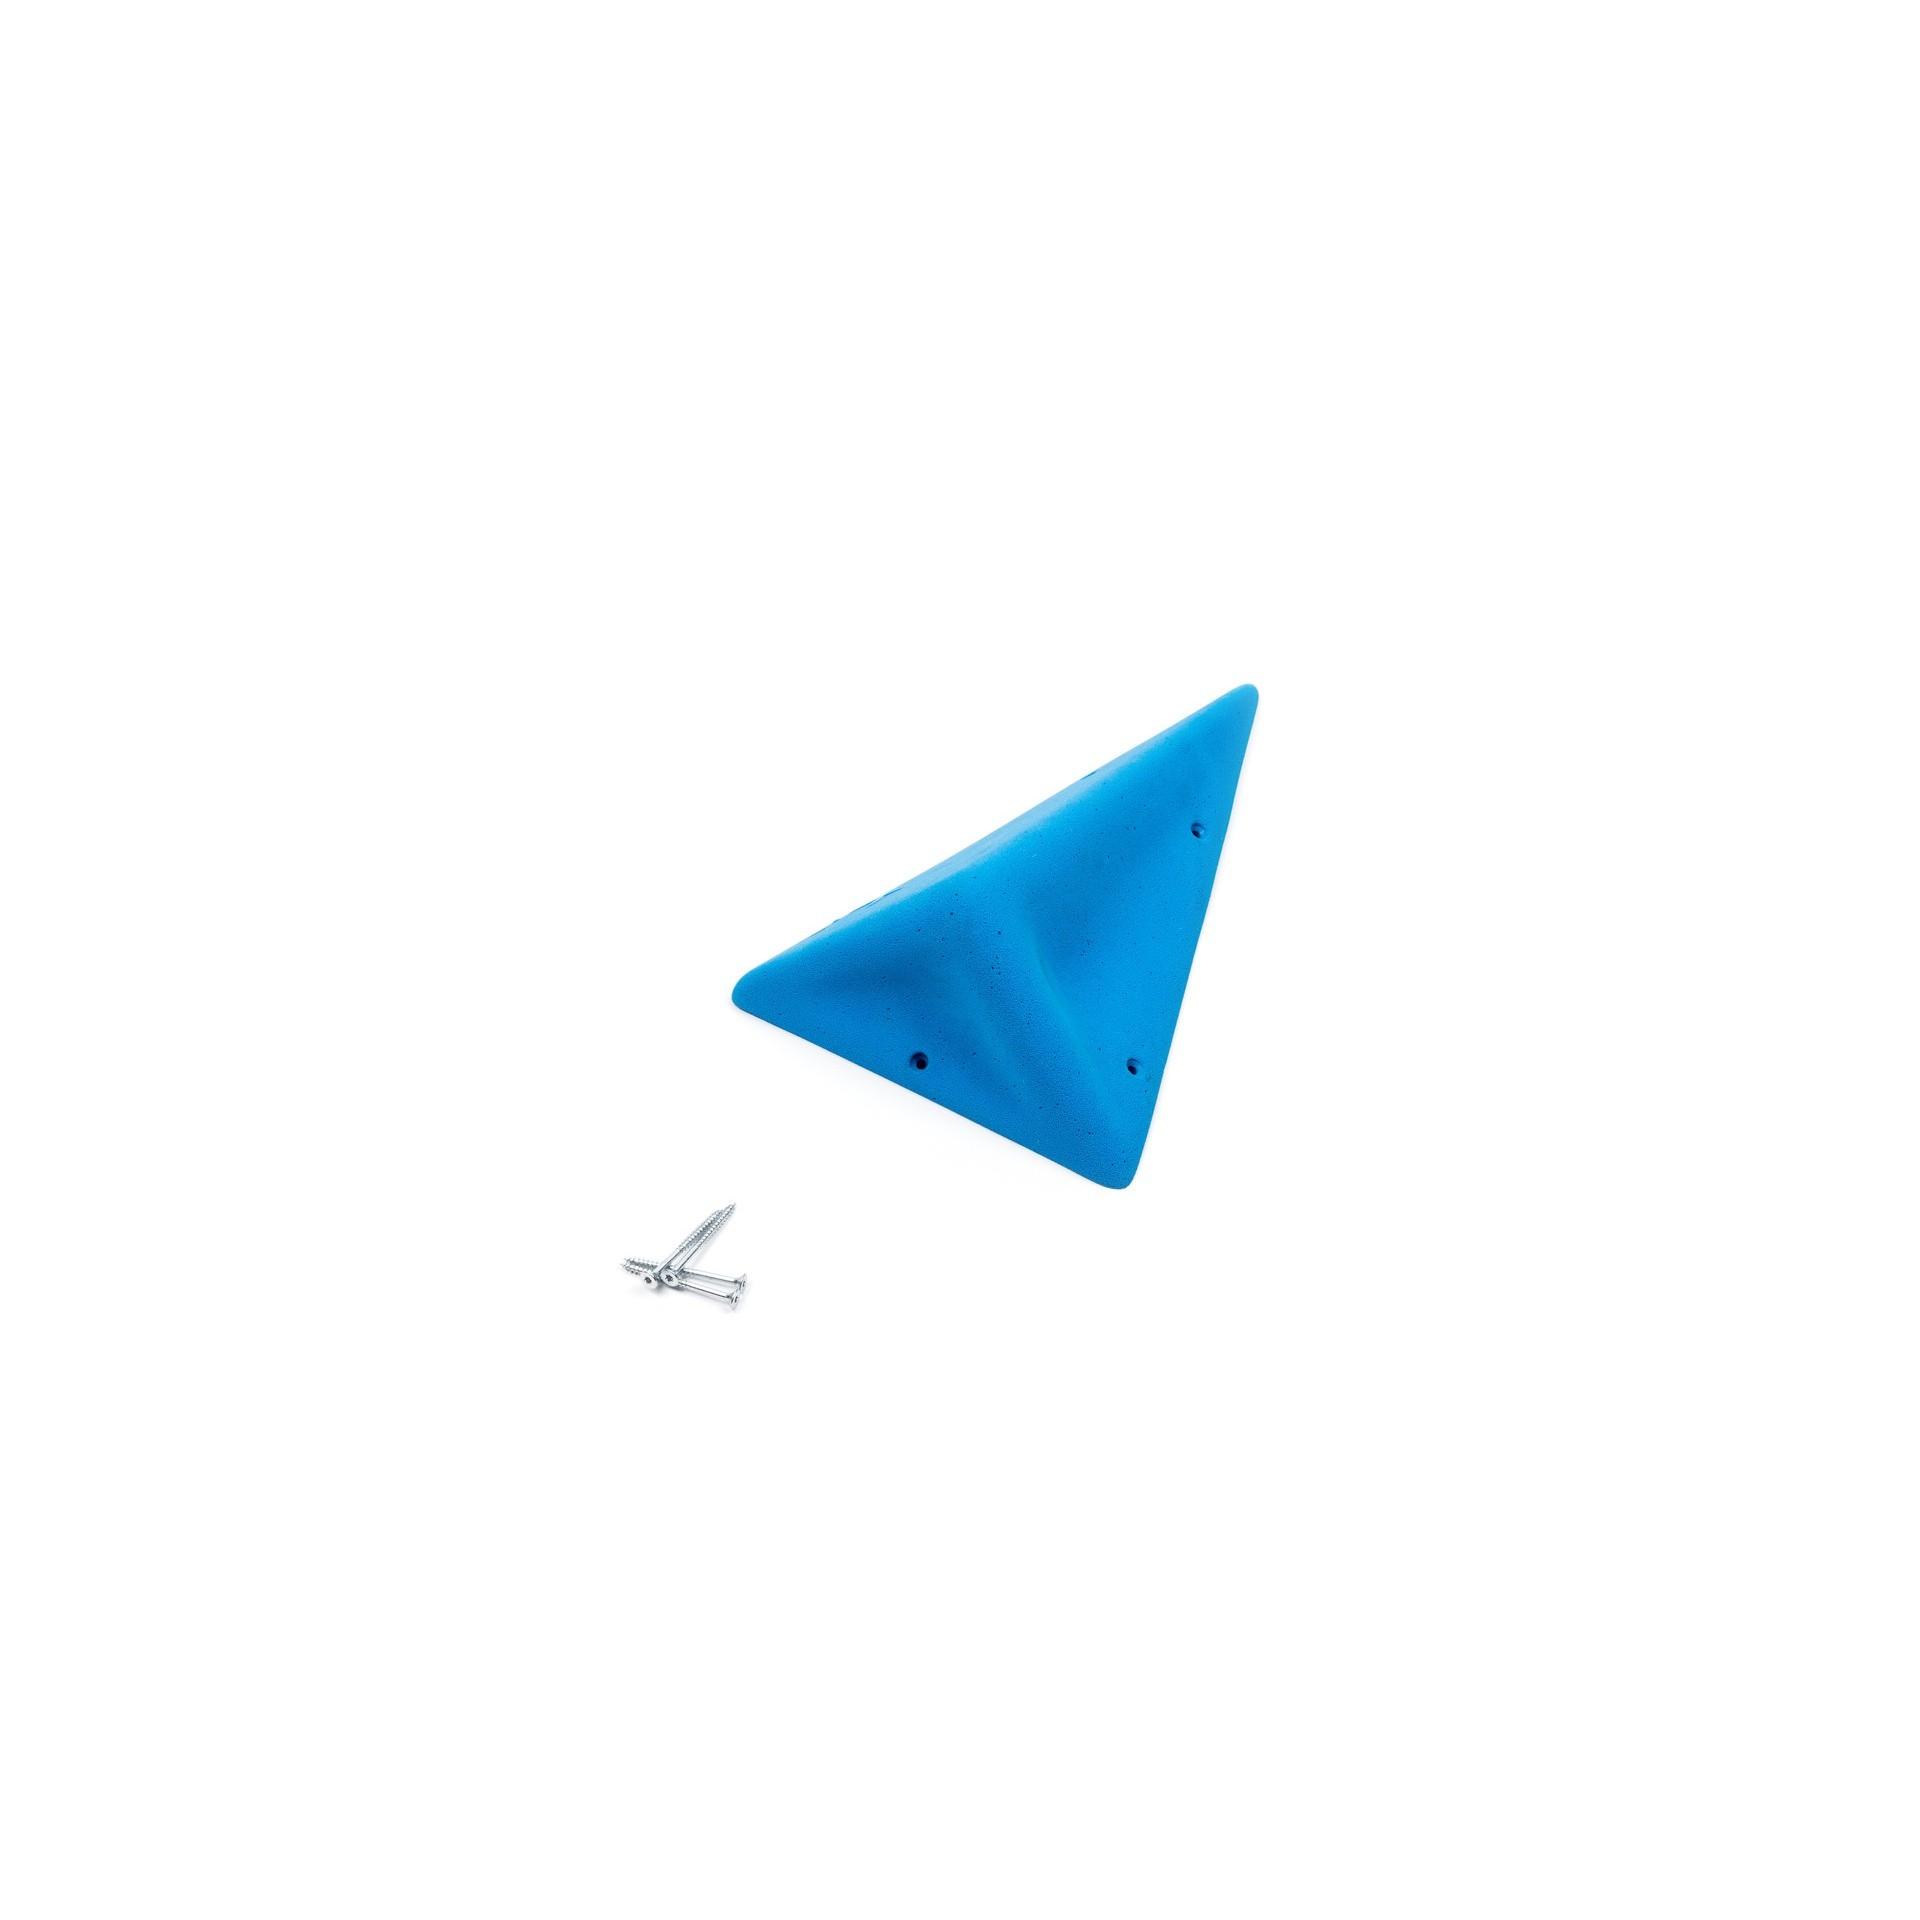 Pure Triangle Mini Volume 1 (PU) - Holds.fr